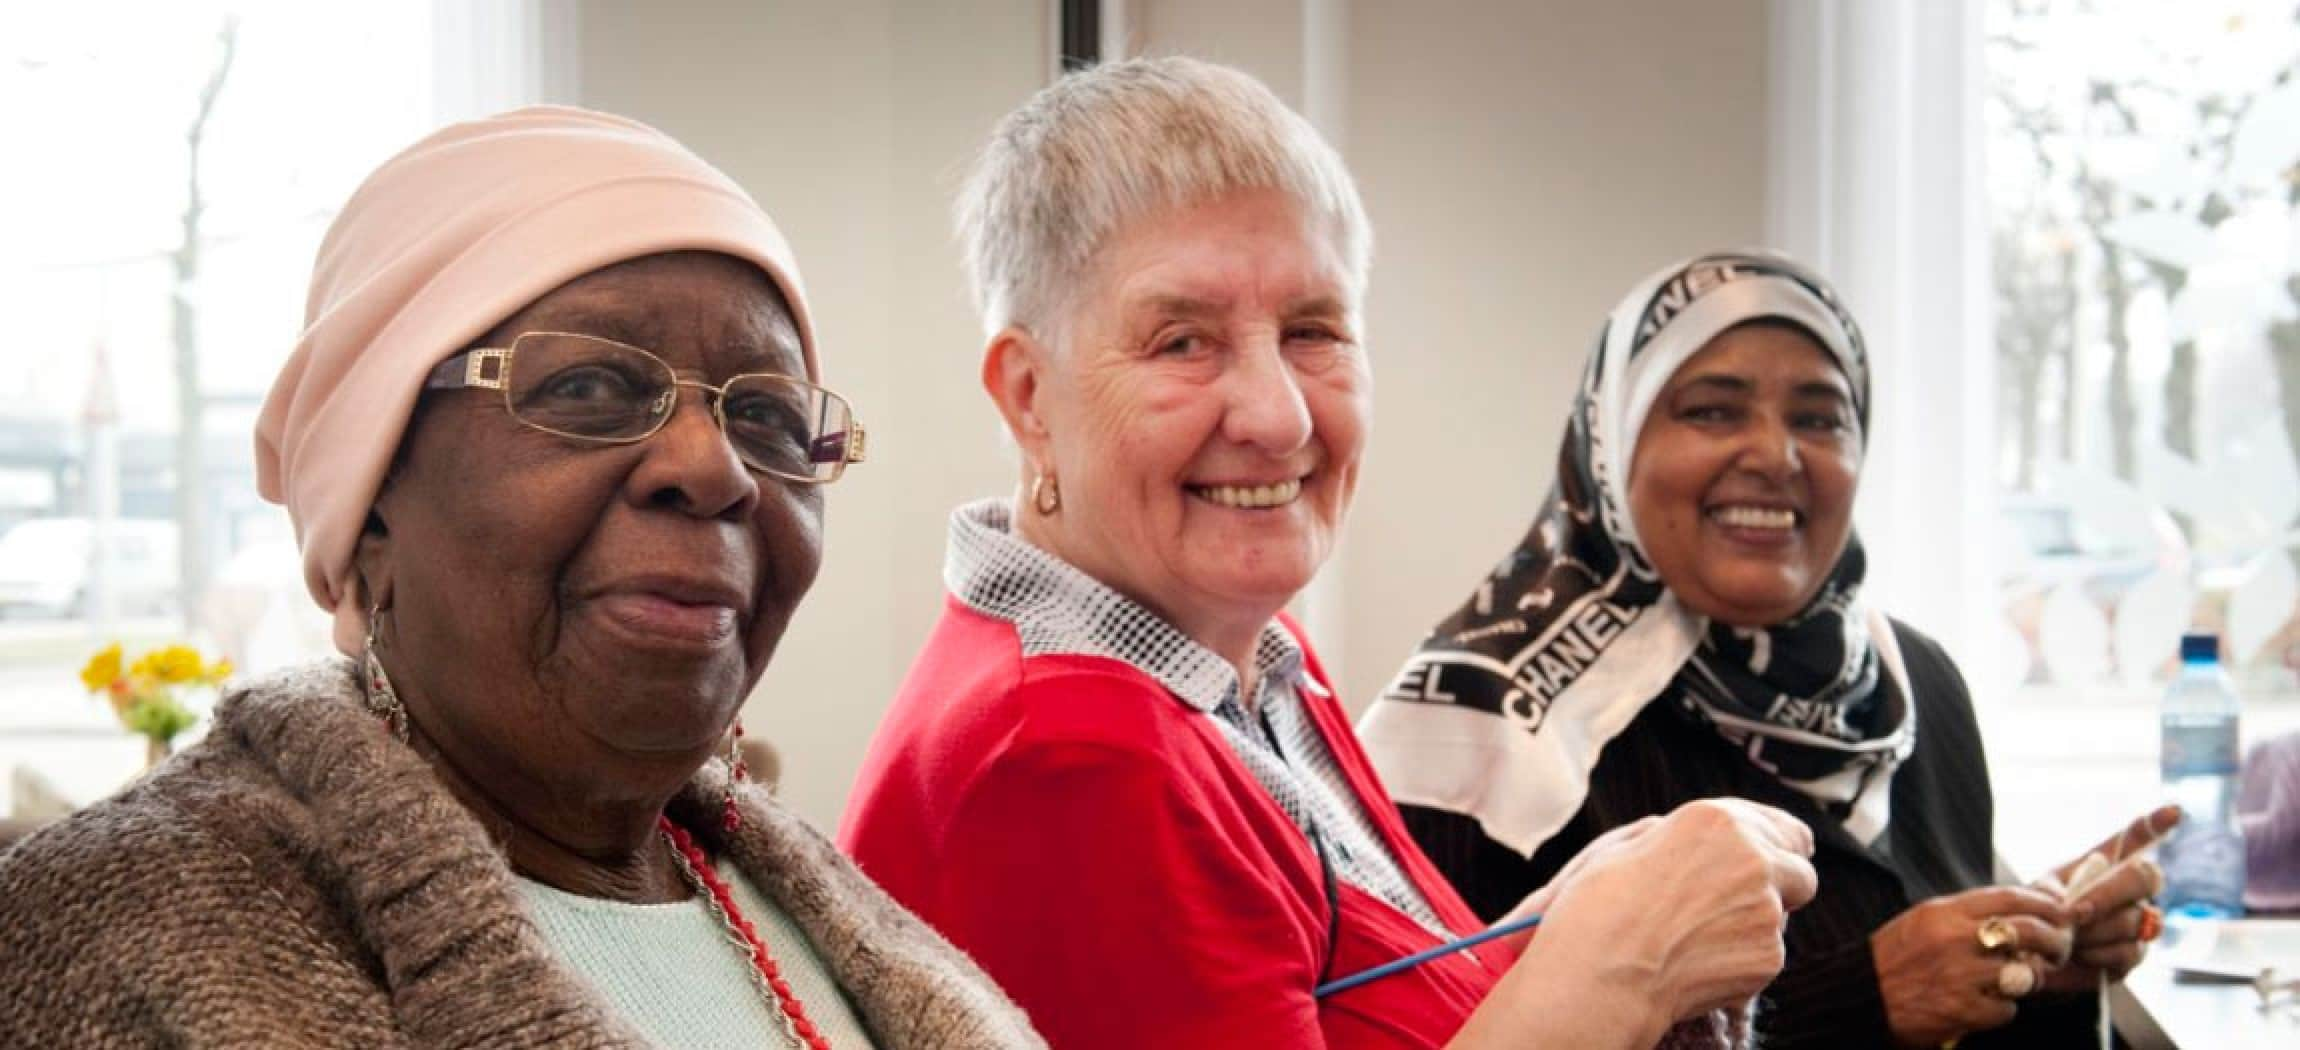 Drie oudere dames multicultureel gezellig samen breien